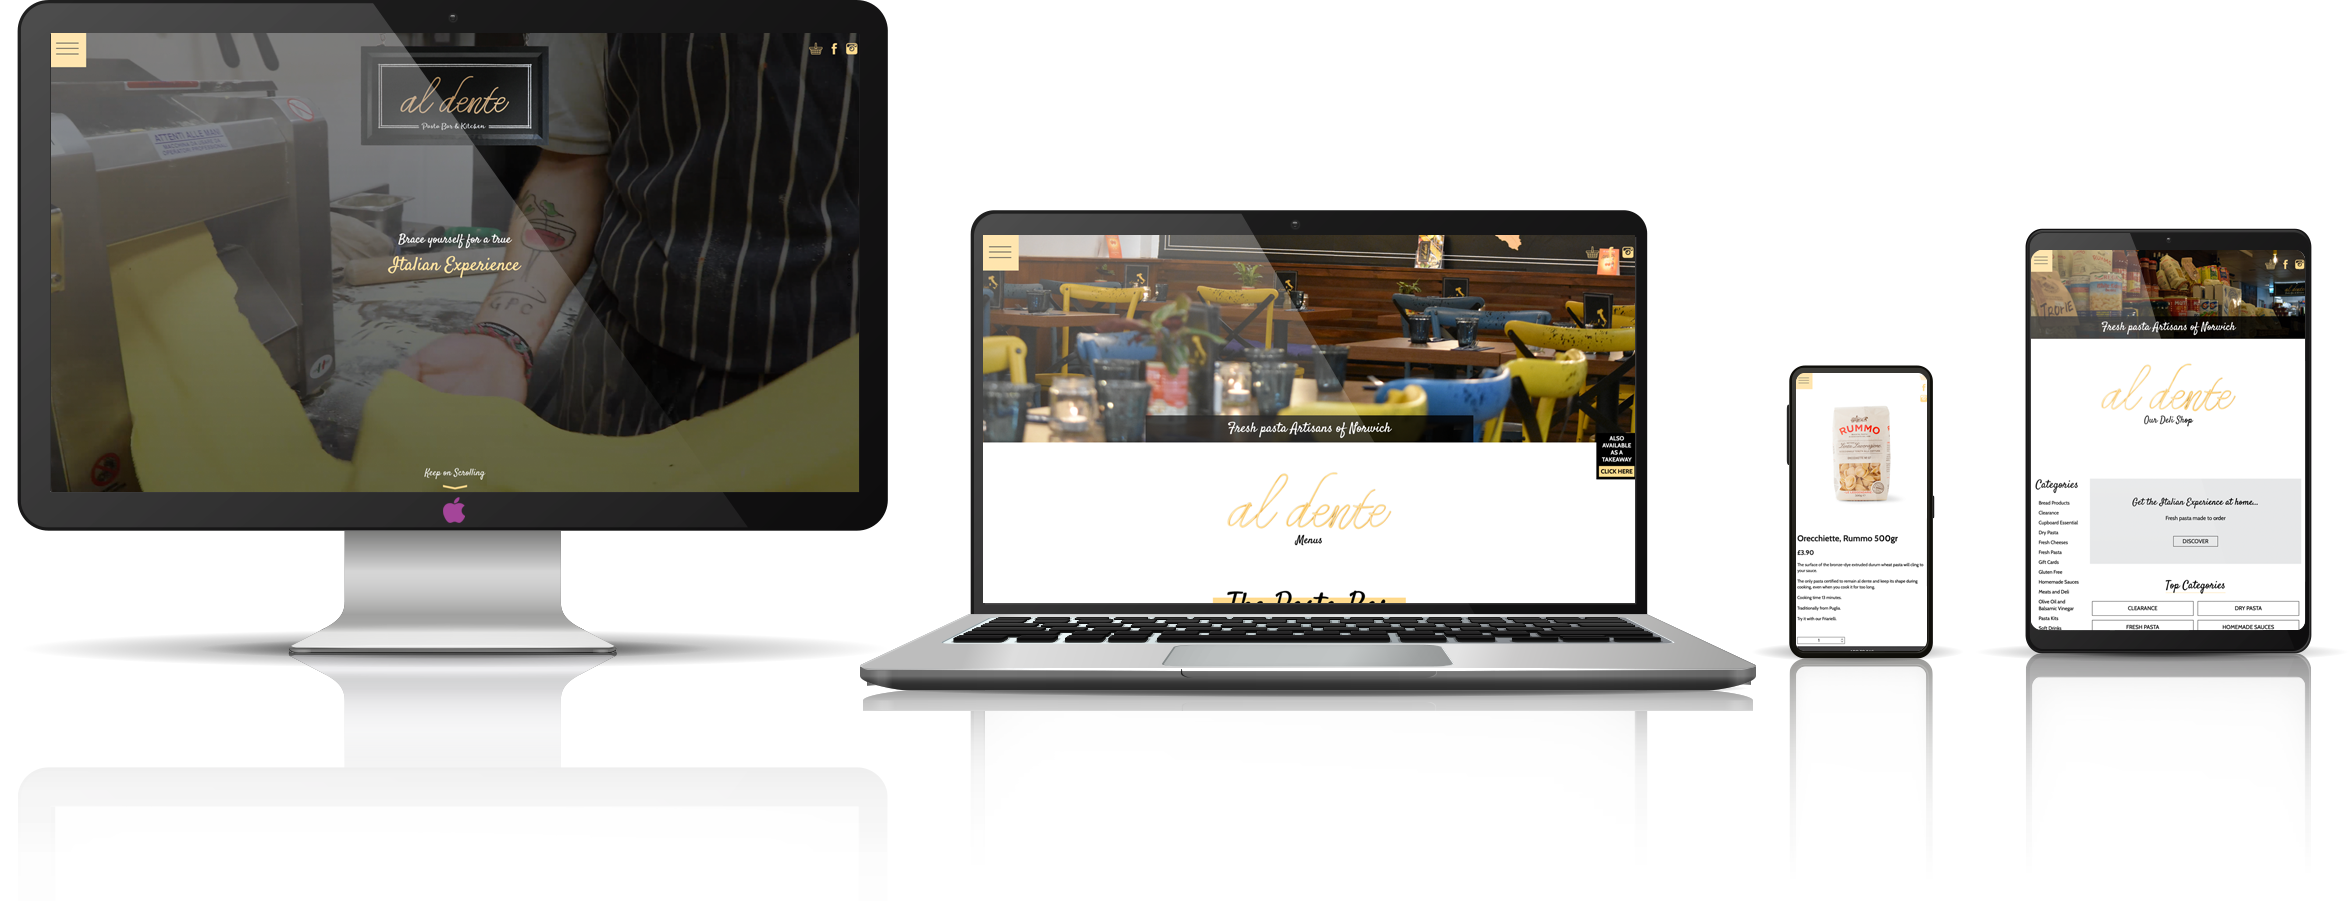 Al Dente Norwich fully responsive new website